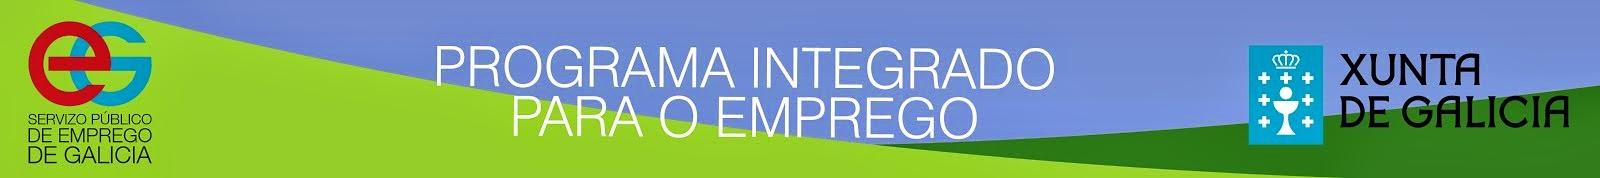 Programa Integrado de Emprego BIO-EMPRENDE